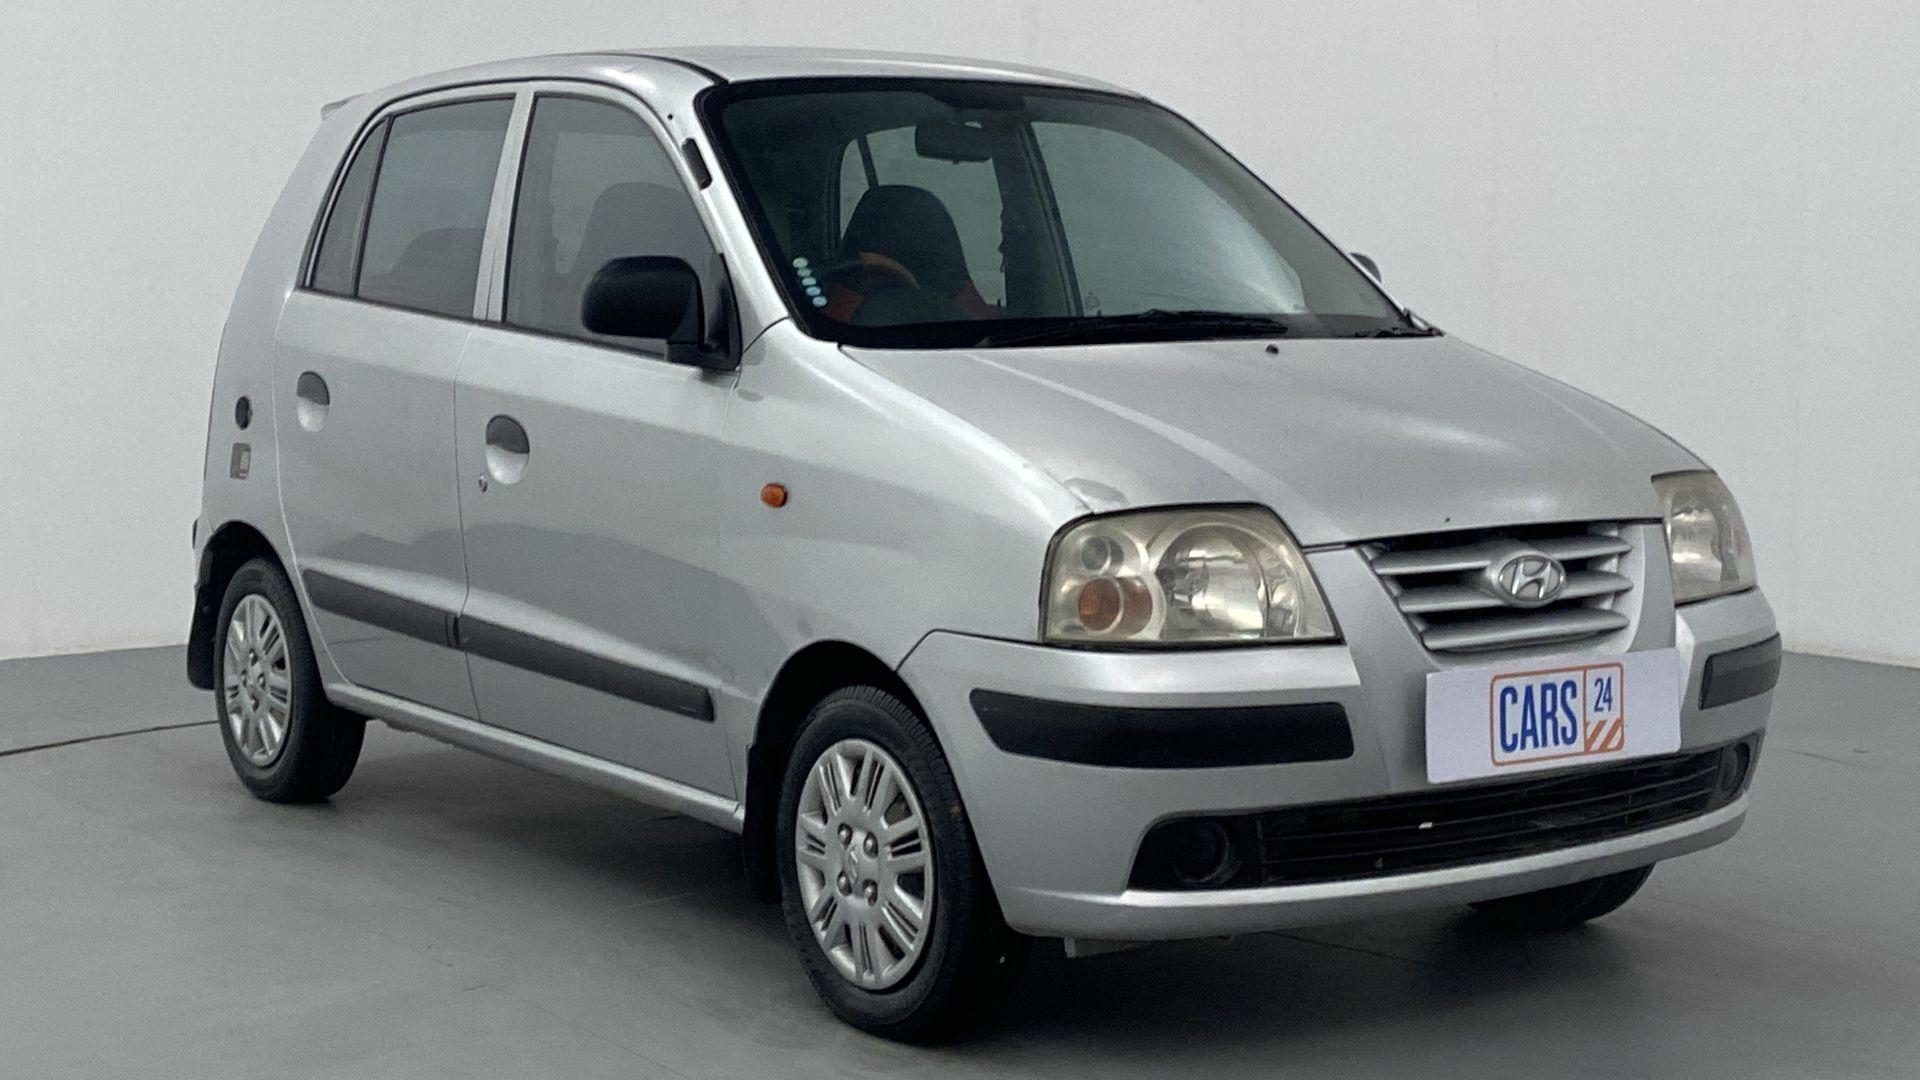 2012 Hyundai Santro Xing GLS LPG